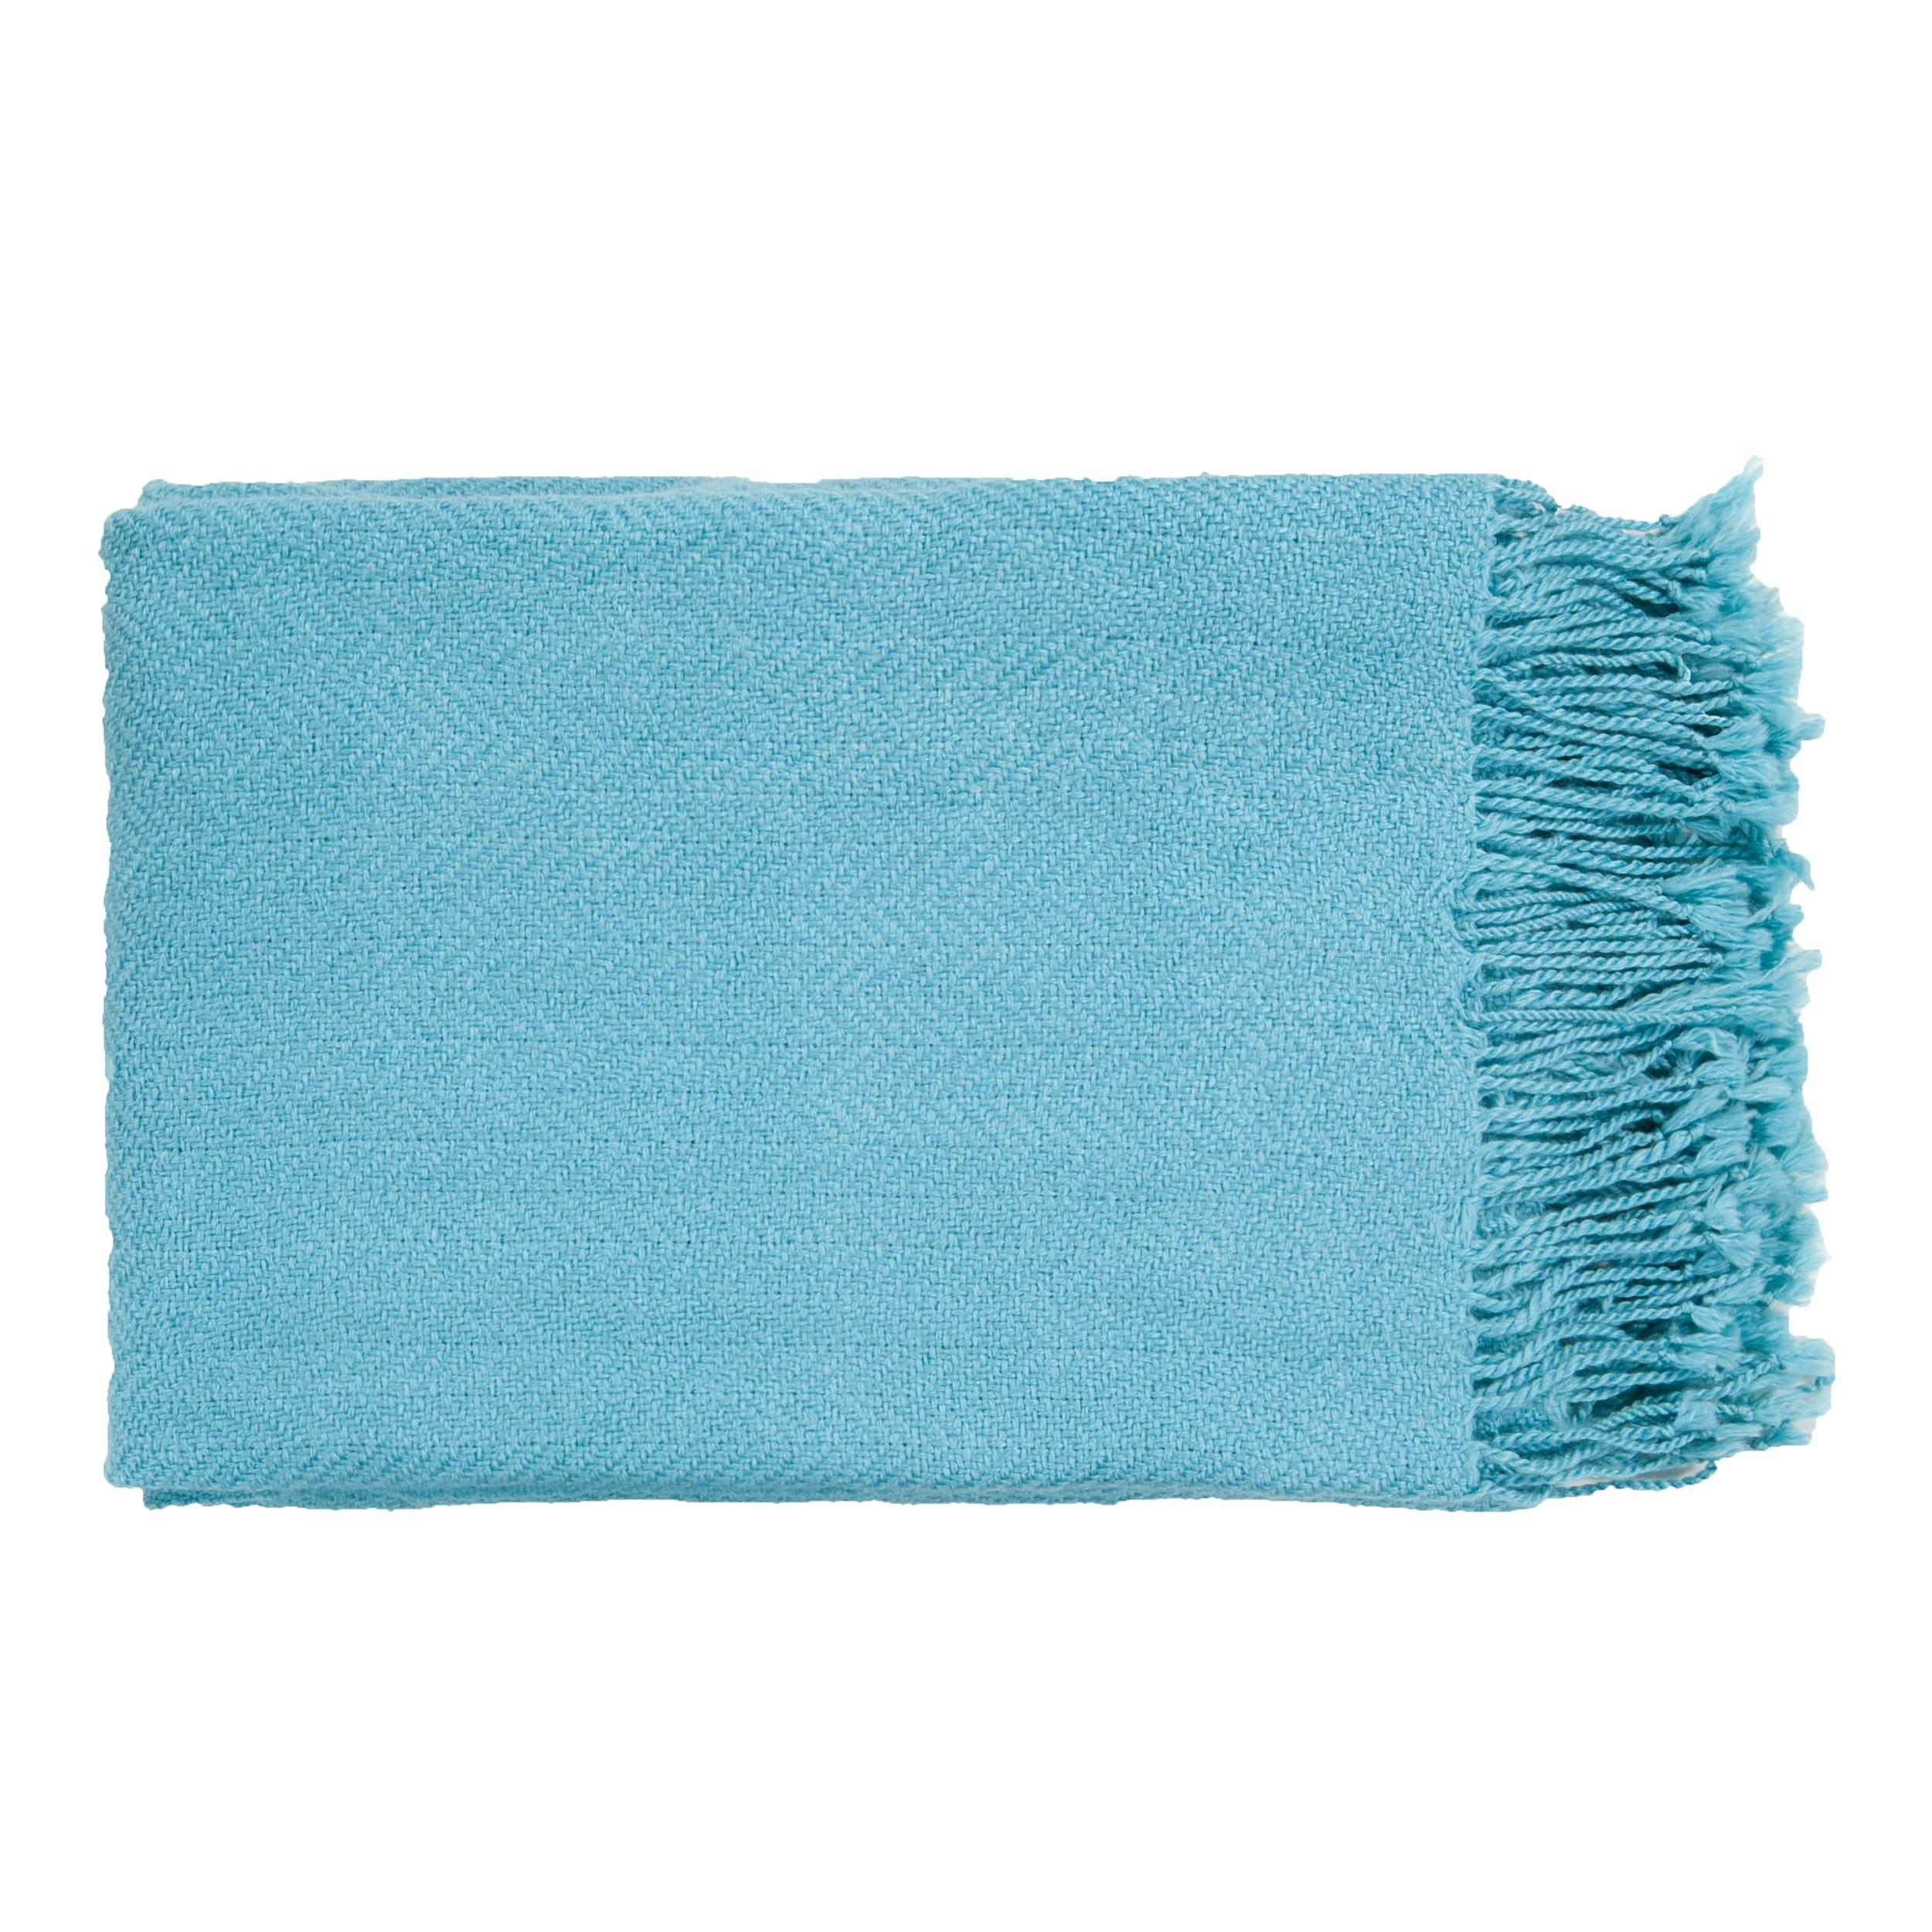 Woven Sloth Acrylic Throw Blanket 50 Quot X 60 Quot